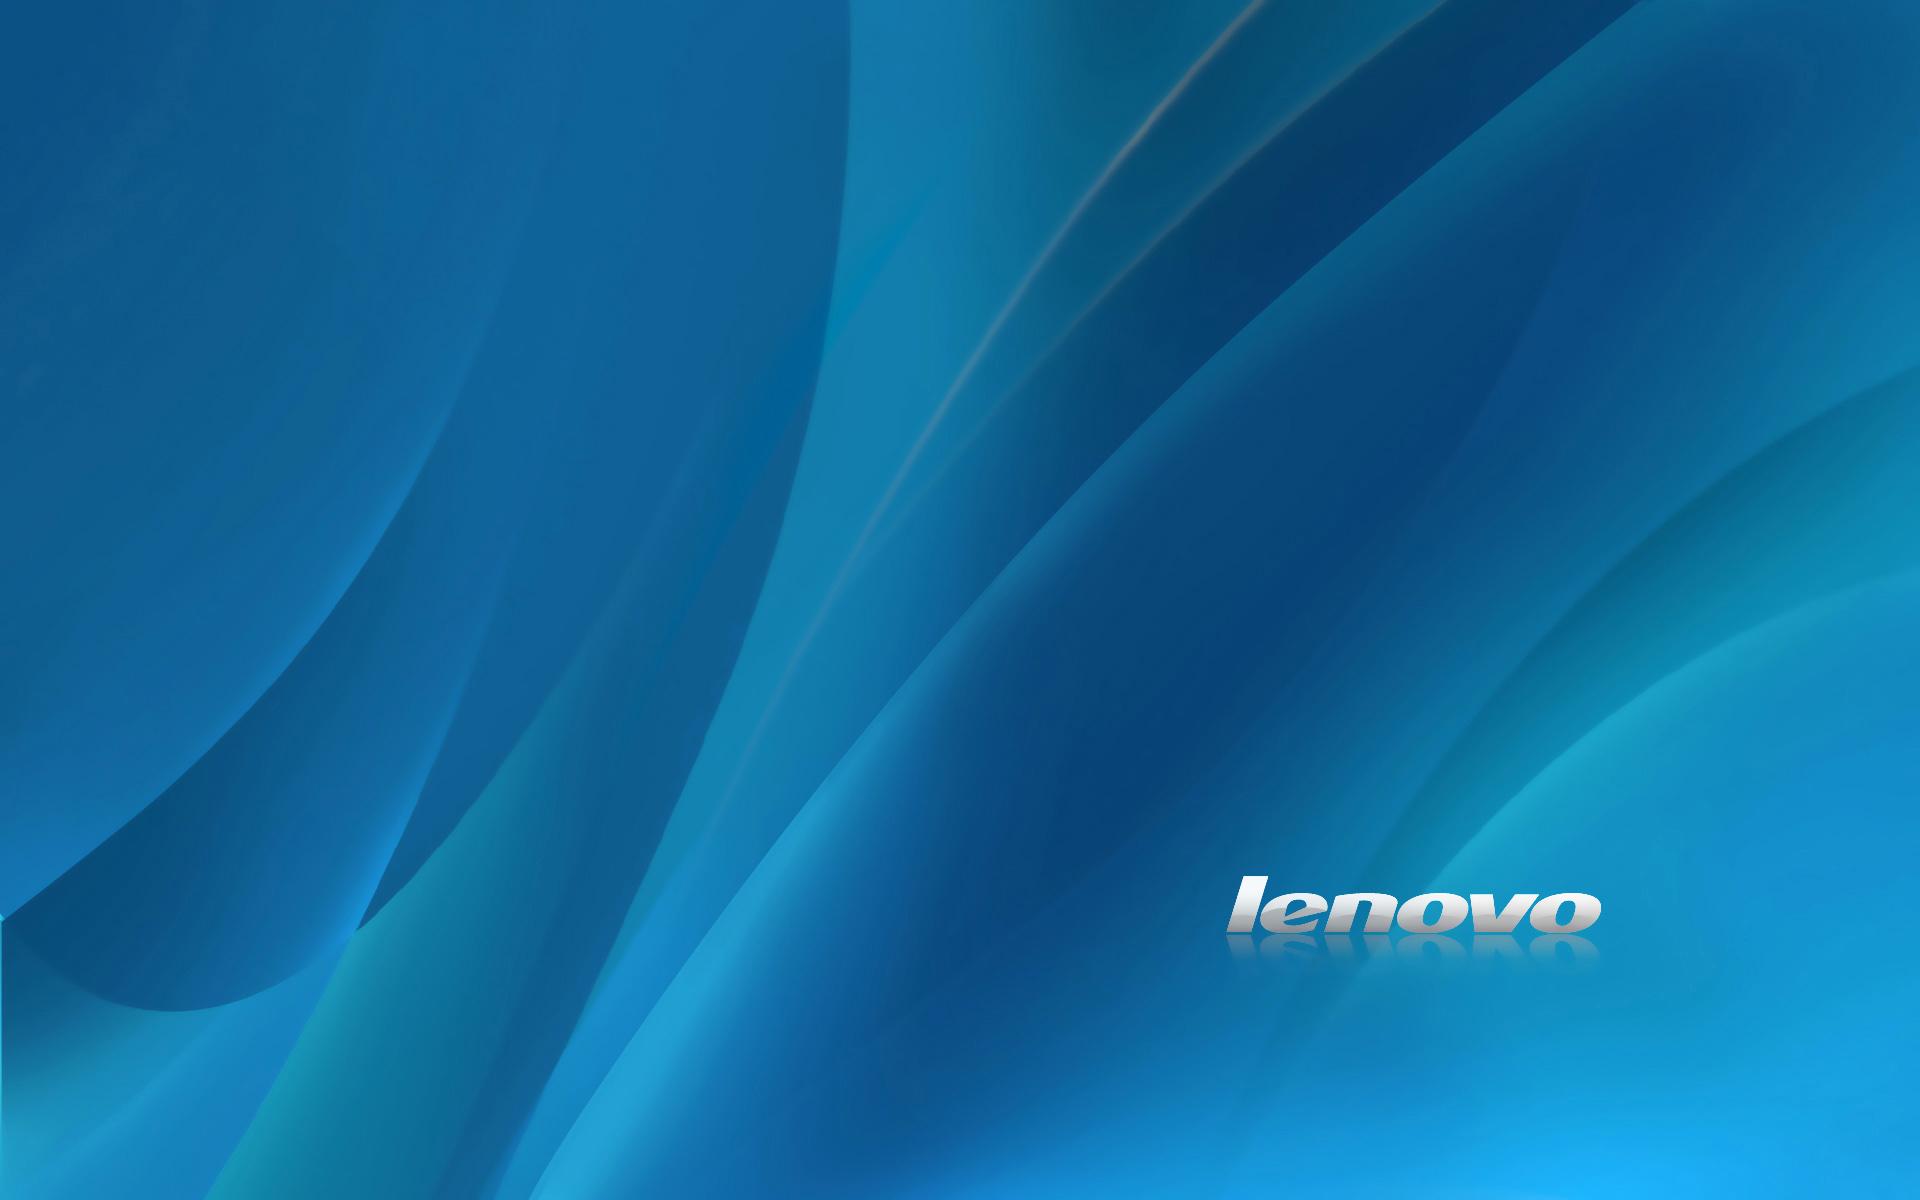 lenovo wallpaper theme wallpapersafari